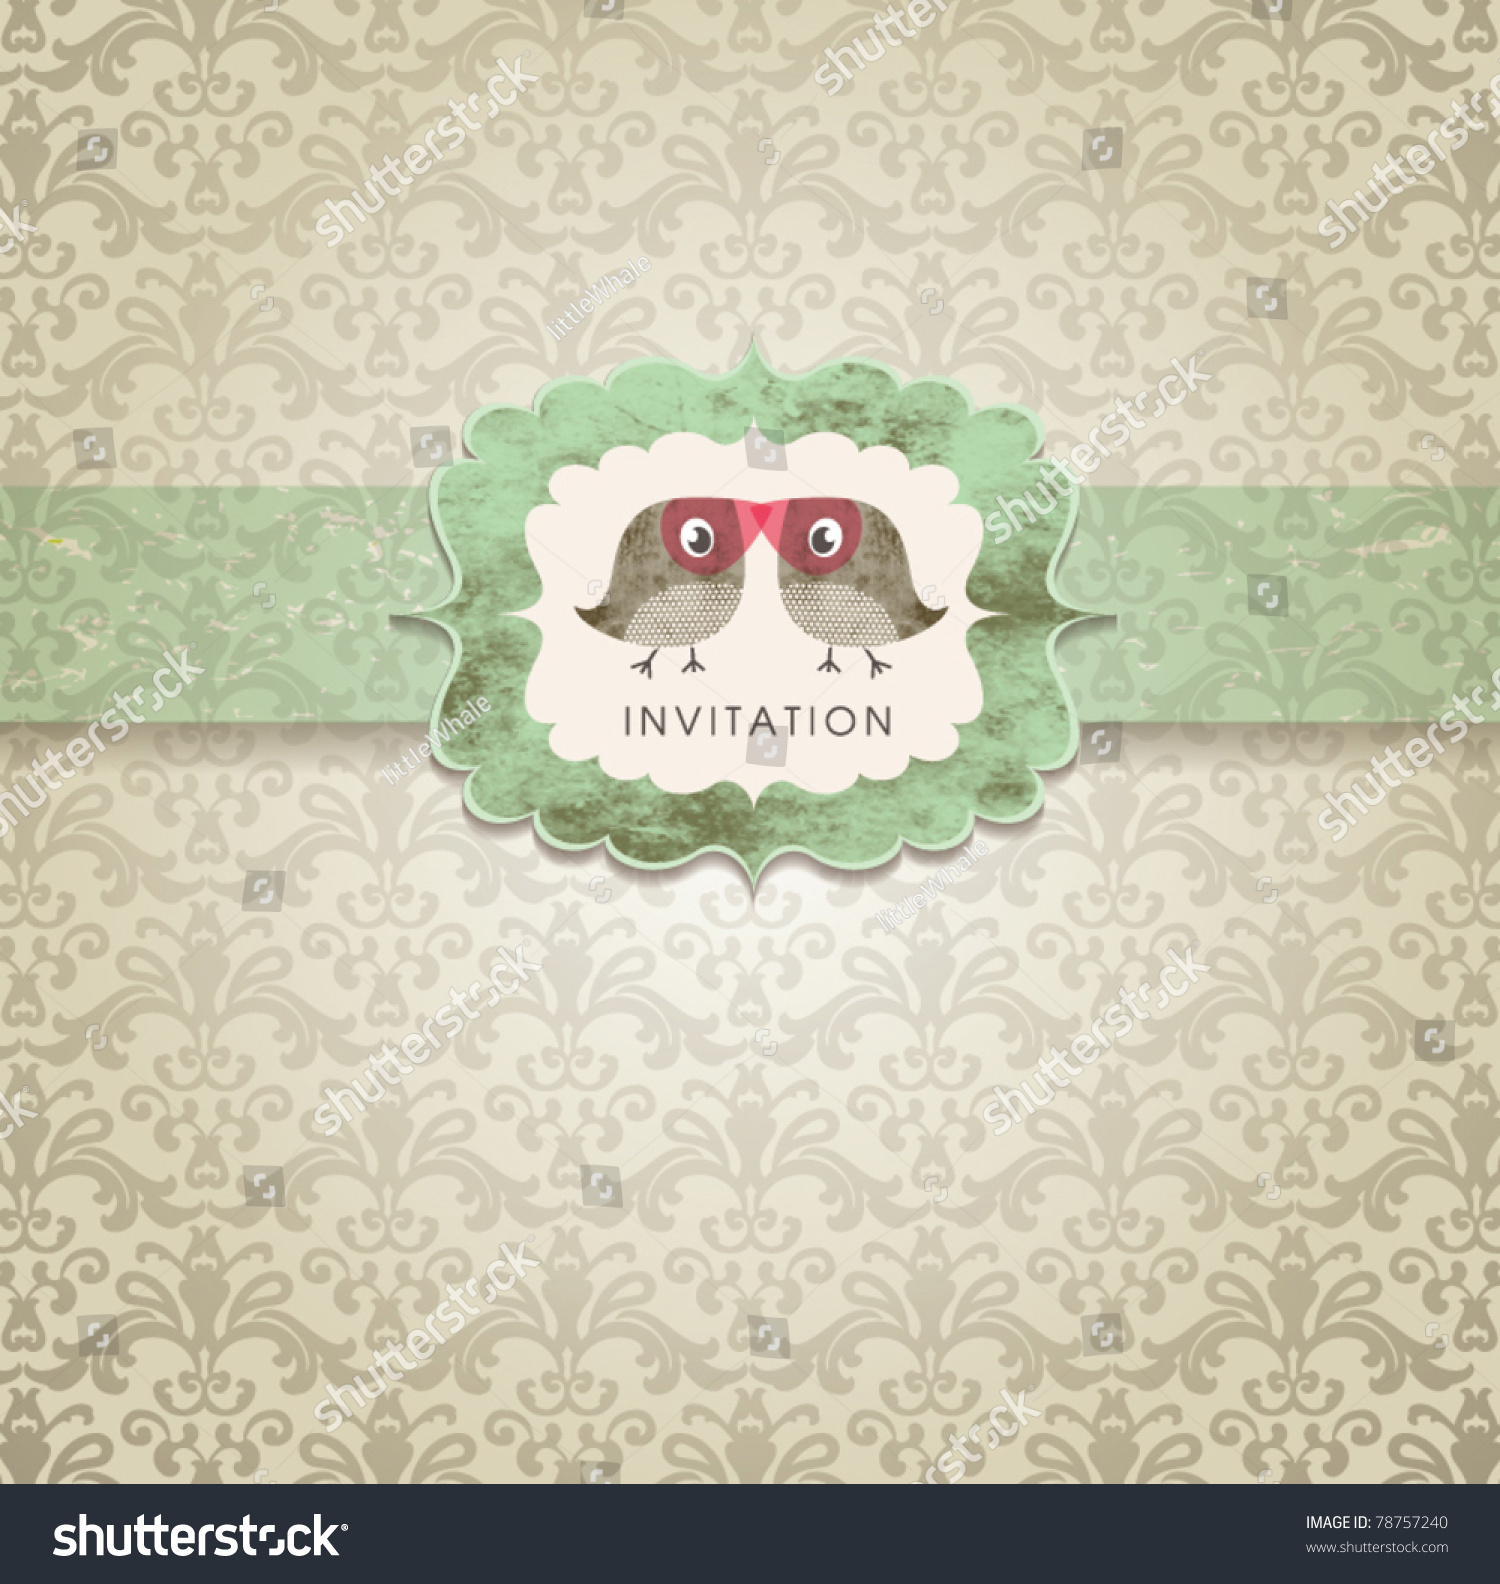 Cute Wedding Invitation Card Vintage Ornament Vector – Cute Wedding Invitation Cards